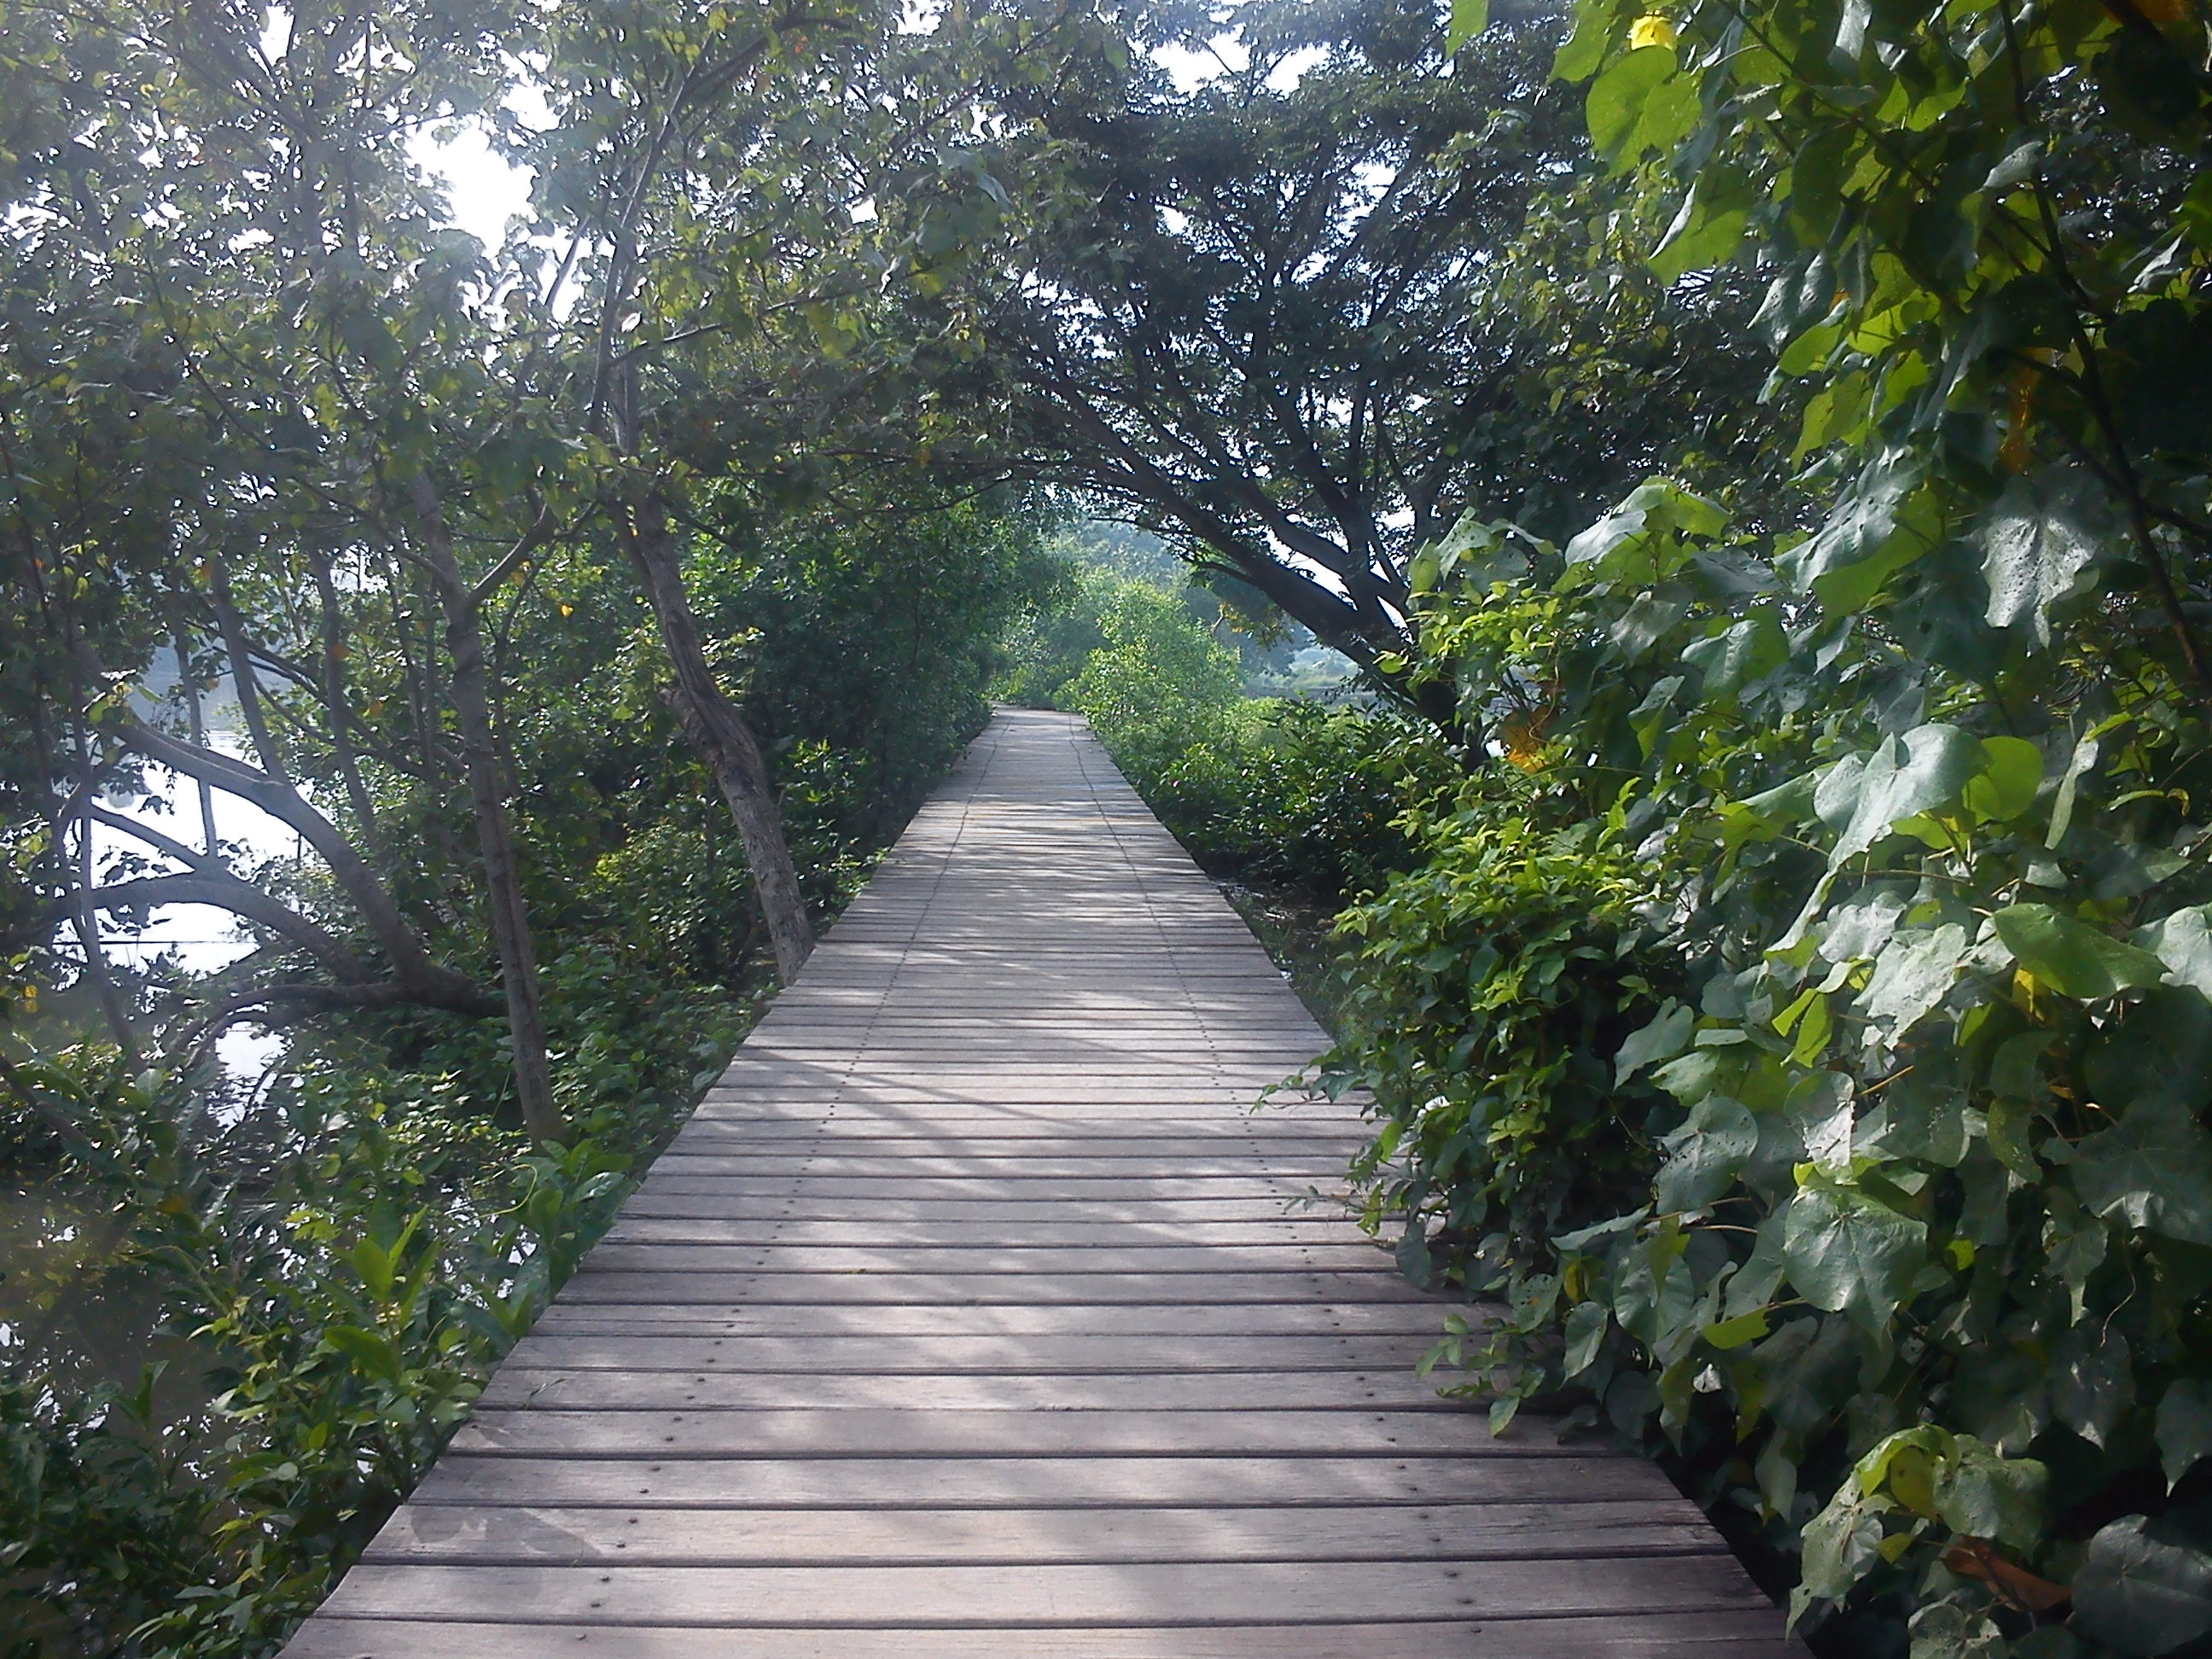 Wonorejo Mangrove Ecotourism Dolan Dolen Wisata Hutan Kota Surabaya